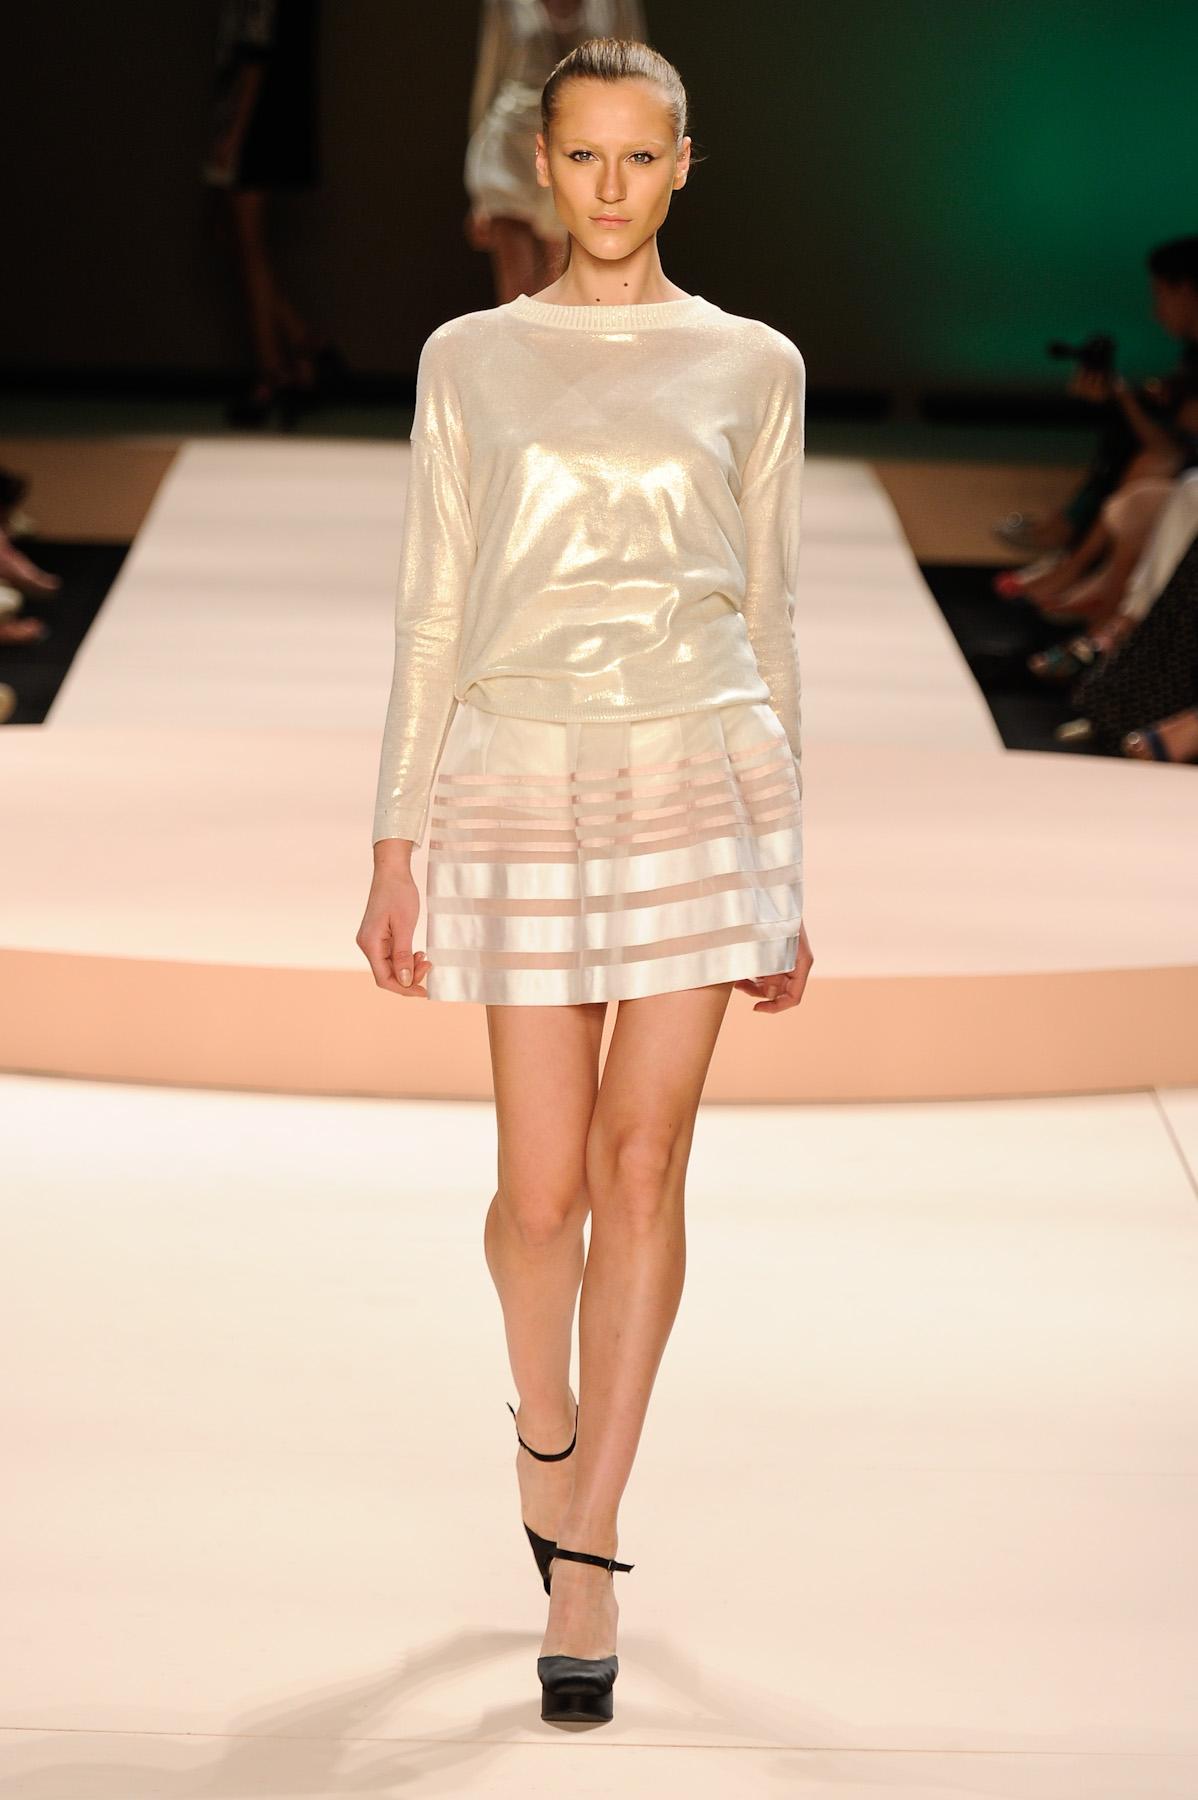 Maria Bonita Extra / Fashion Rio / Inverno 2012 RTW